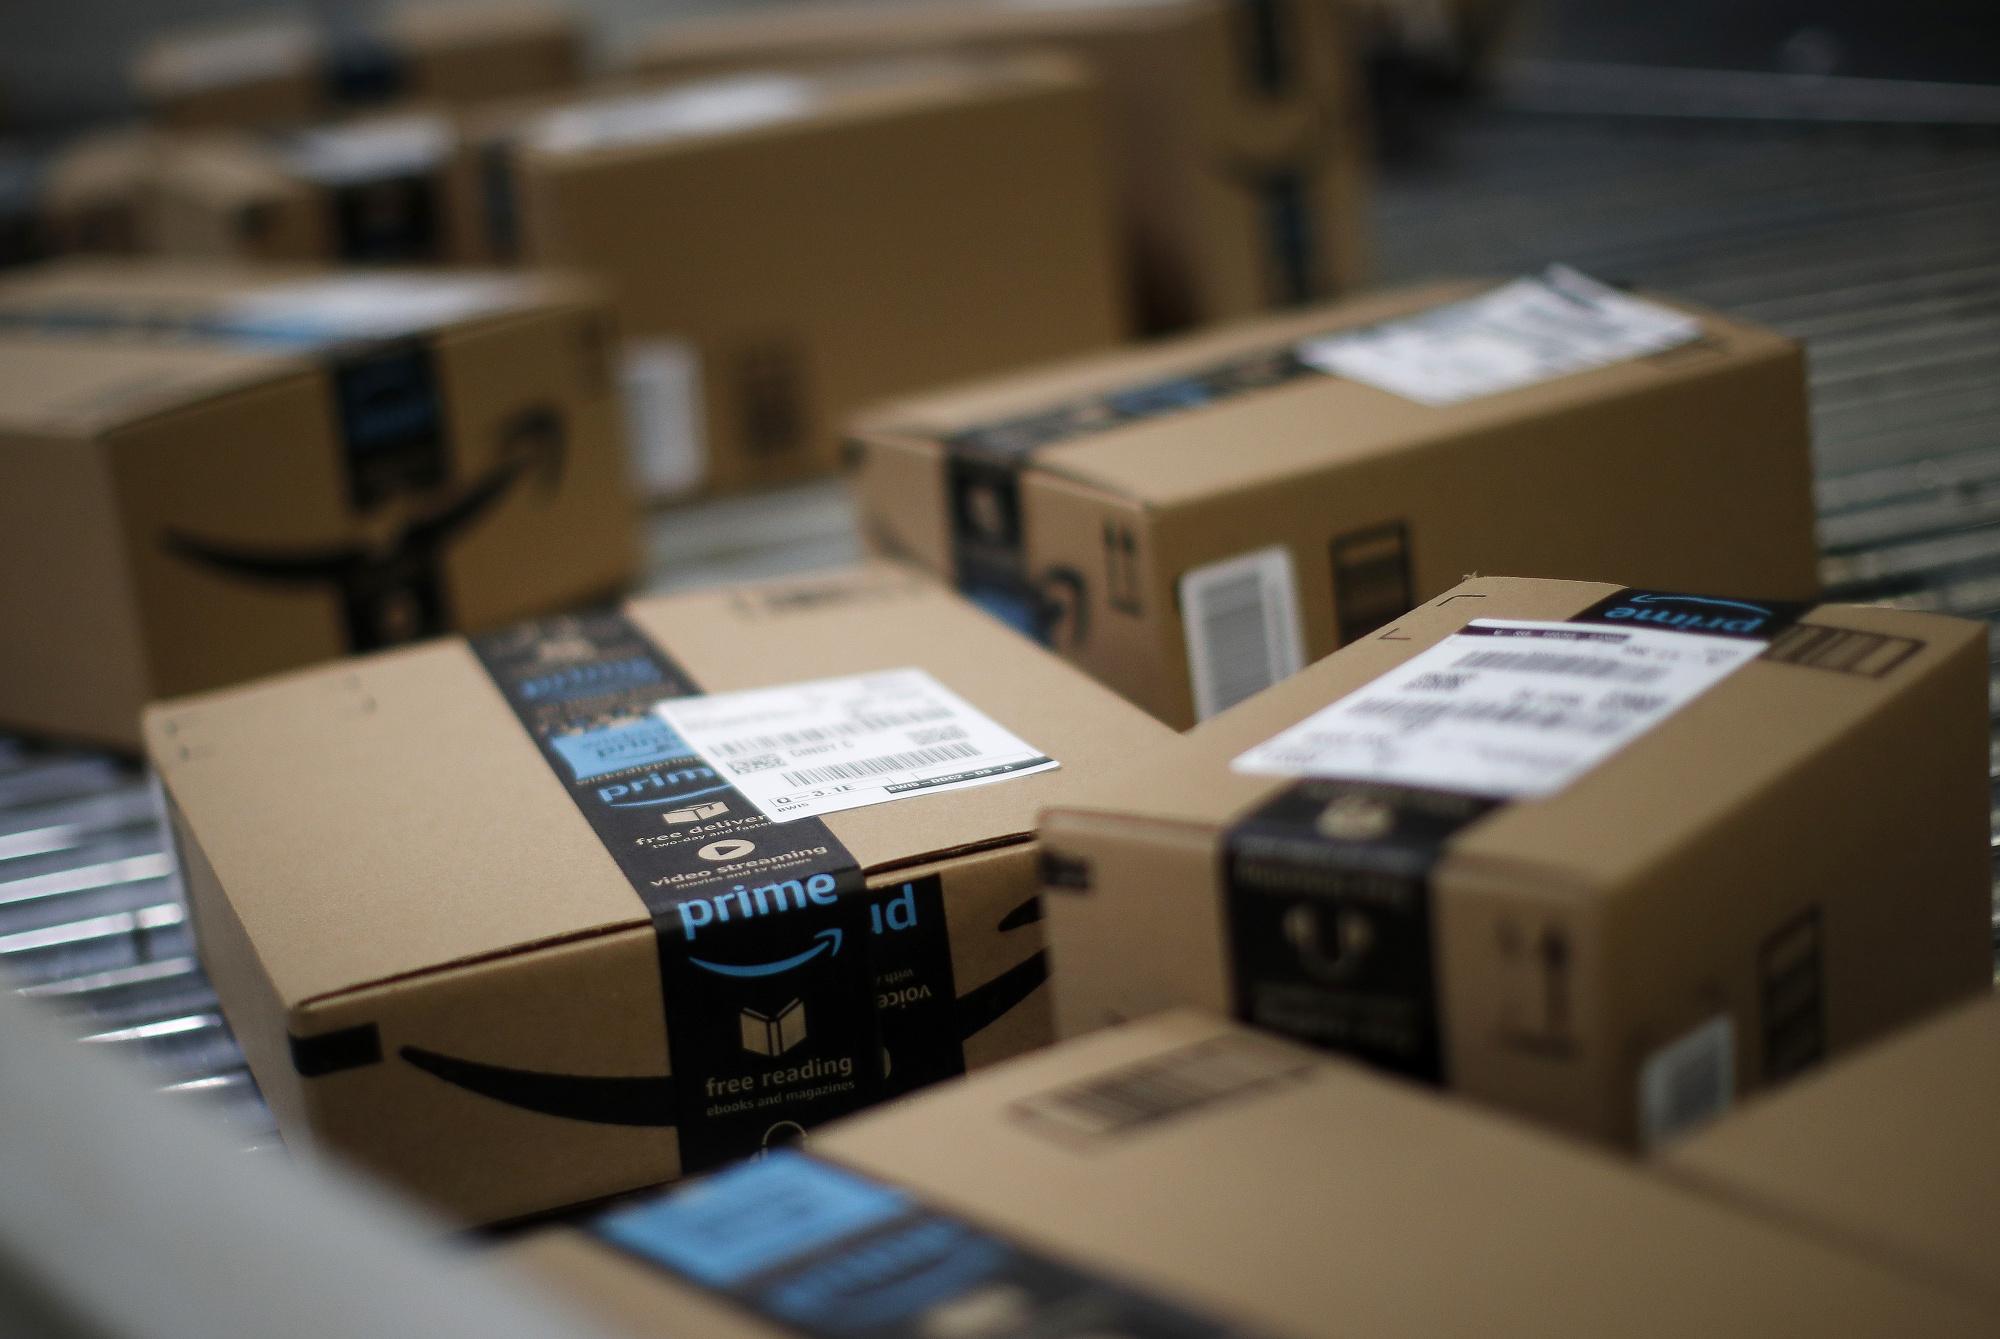 Employees at Amazon's New NYC Warehouse Launch Unionization Push